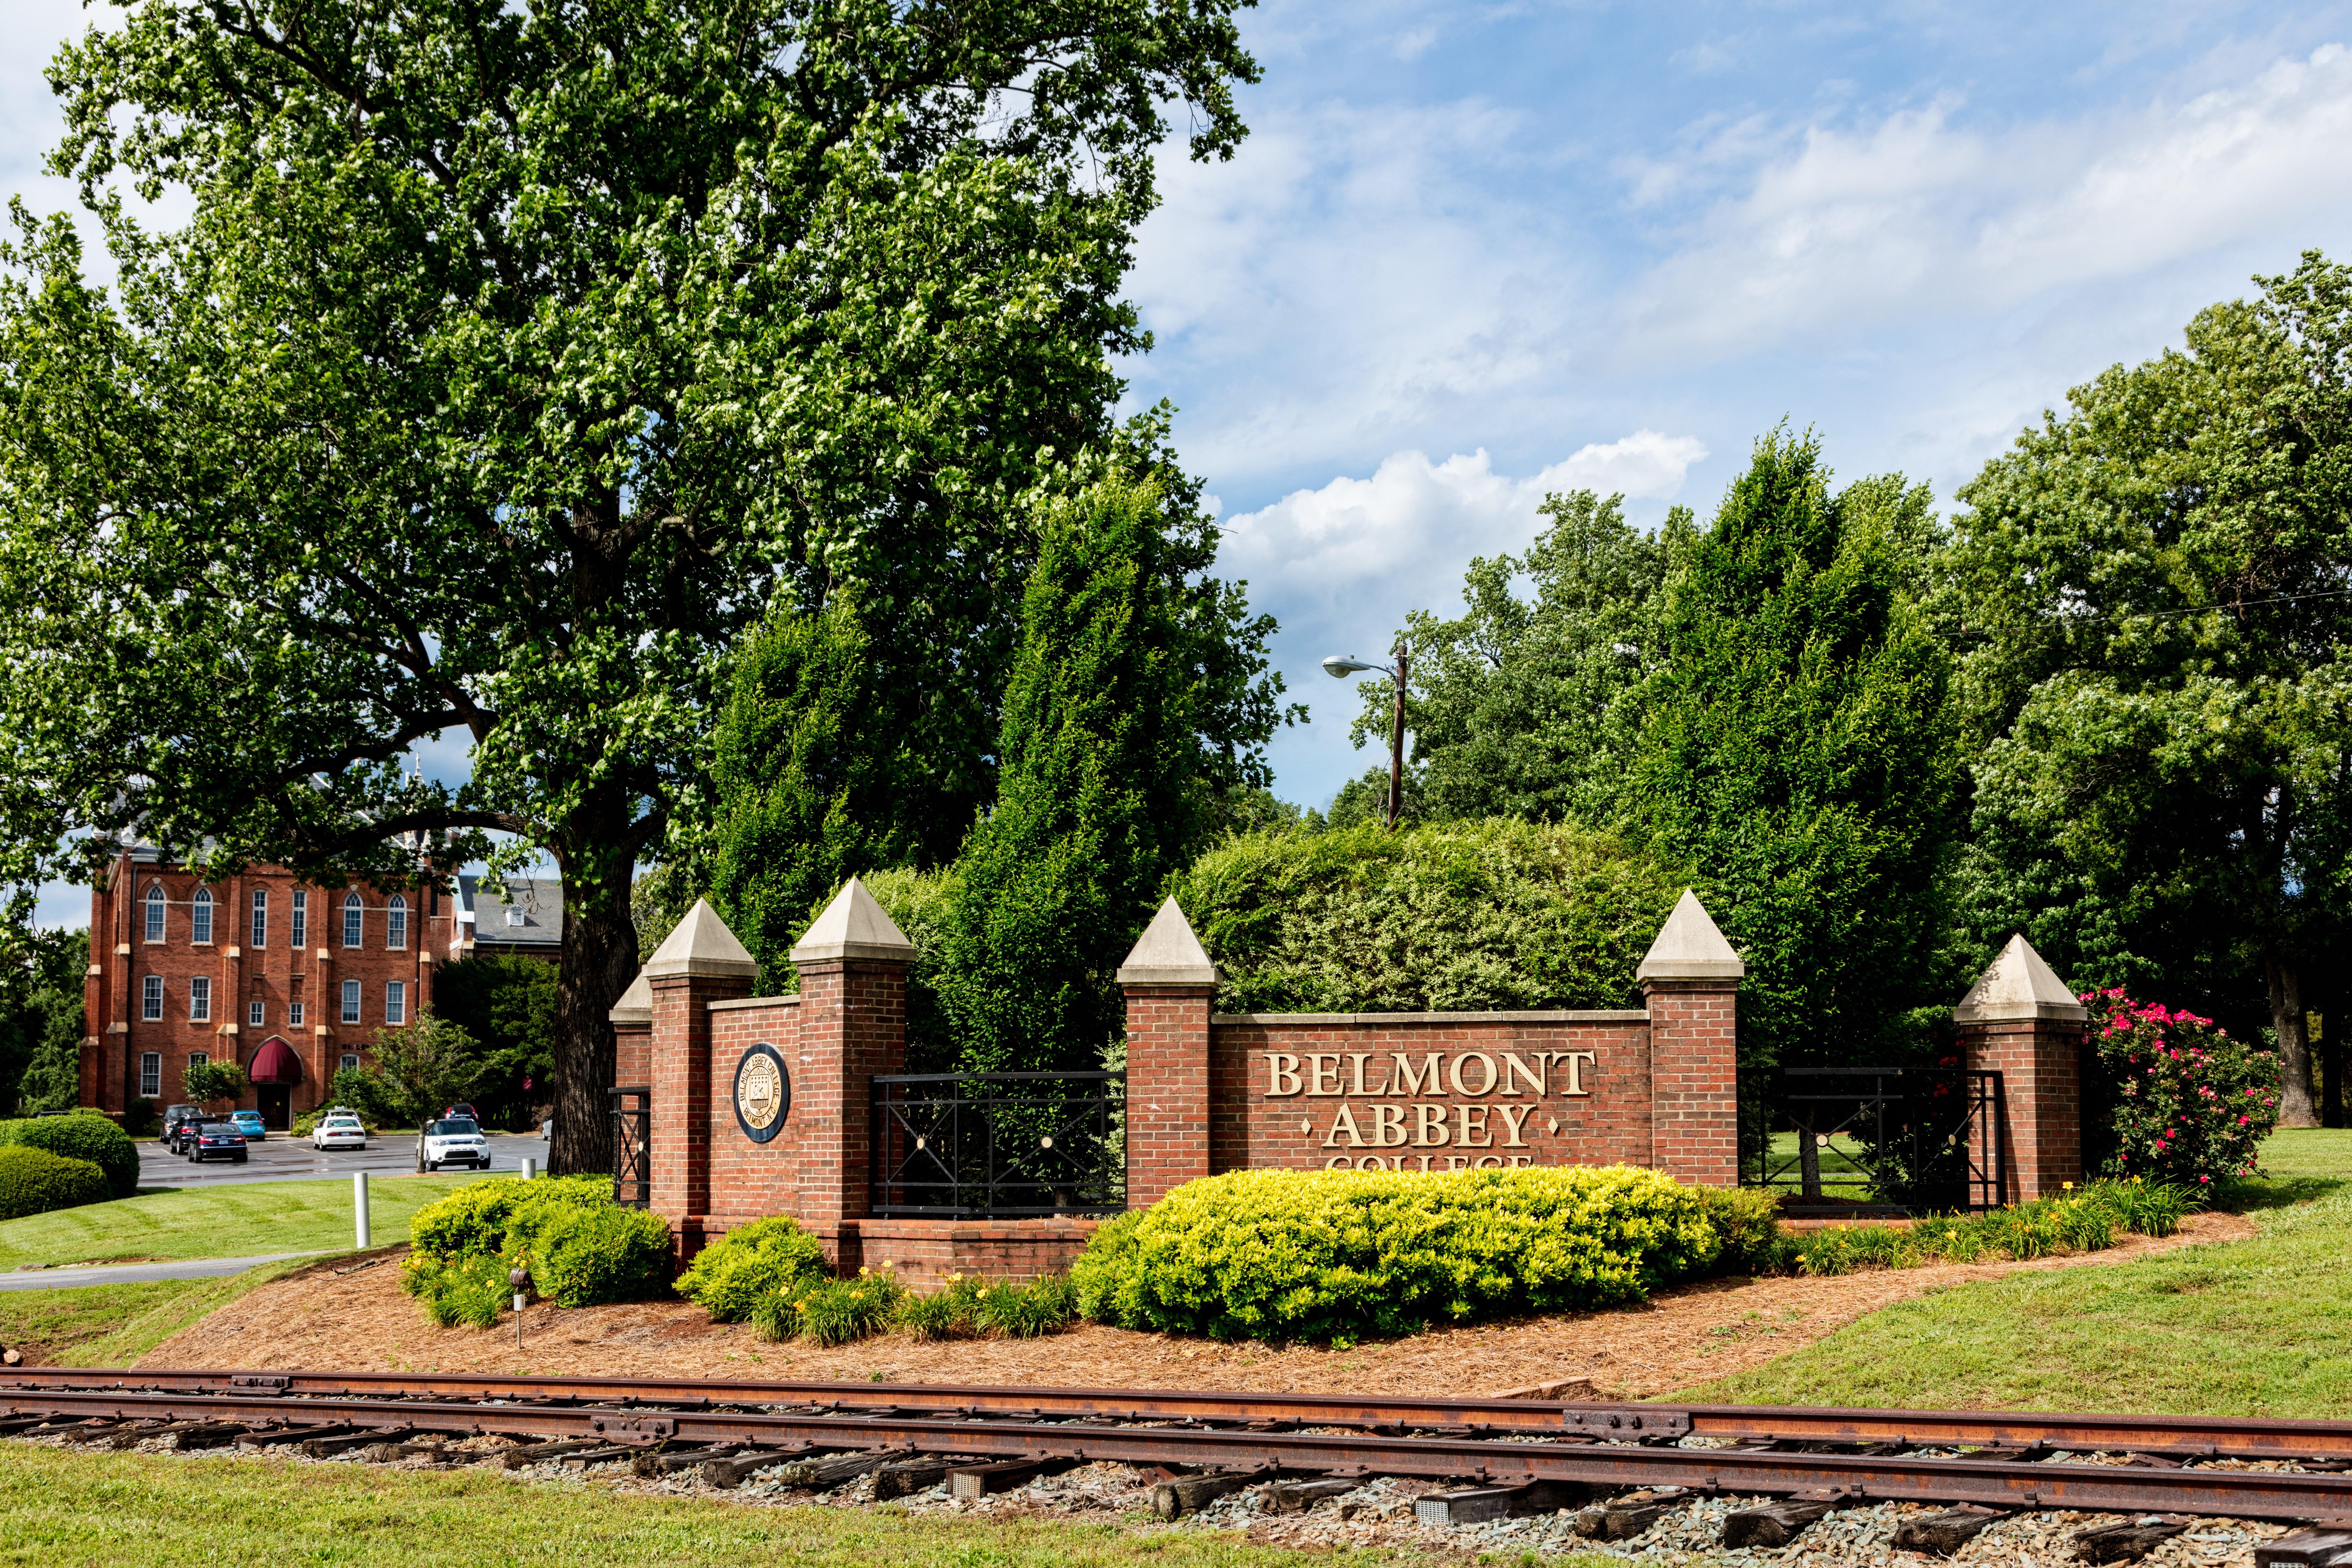 Belmont Abbey College Sign.jpg